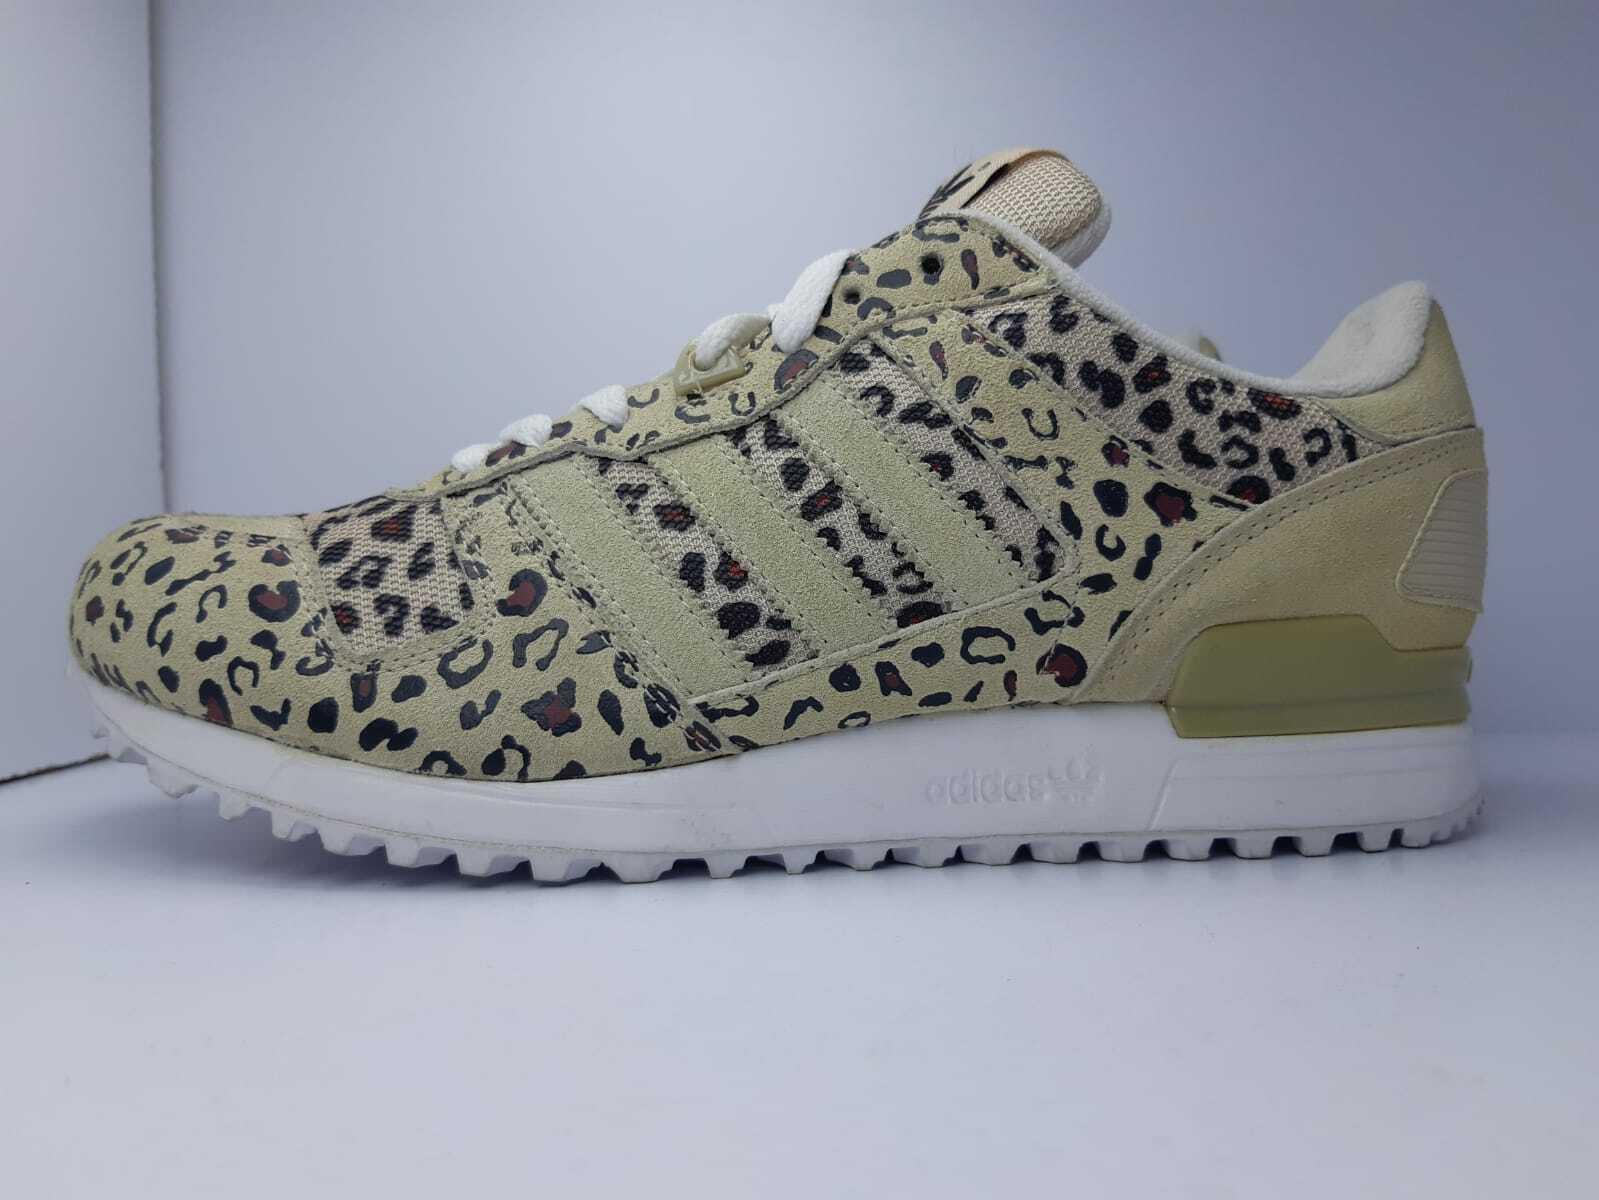 Chaussures Adidas N. 44 2 3 UK 10 Originals ZX 700 Leopard Cheetah Retro ART. B34330